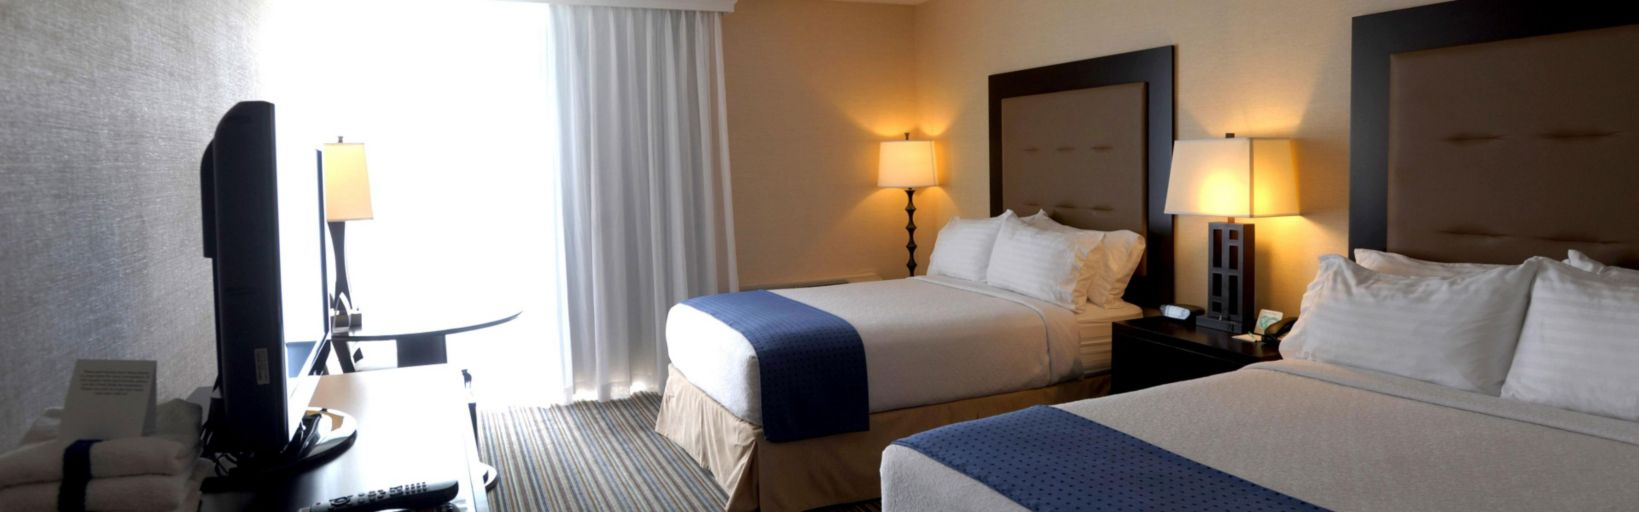 Holiday Inn Grand Haven Spring Lake Hotel By Ihg